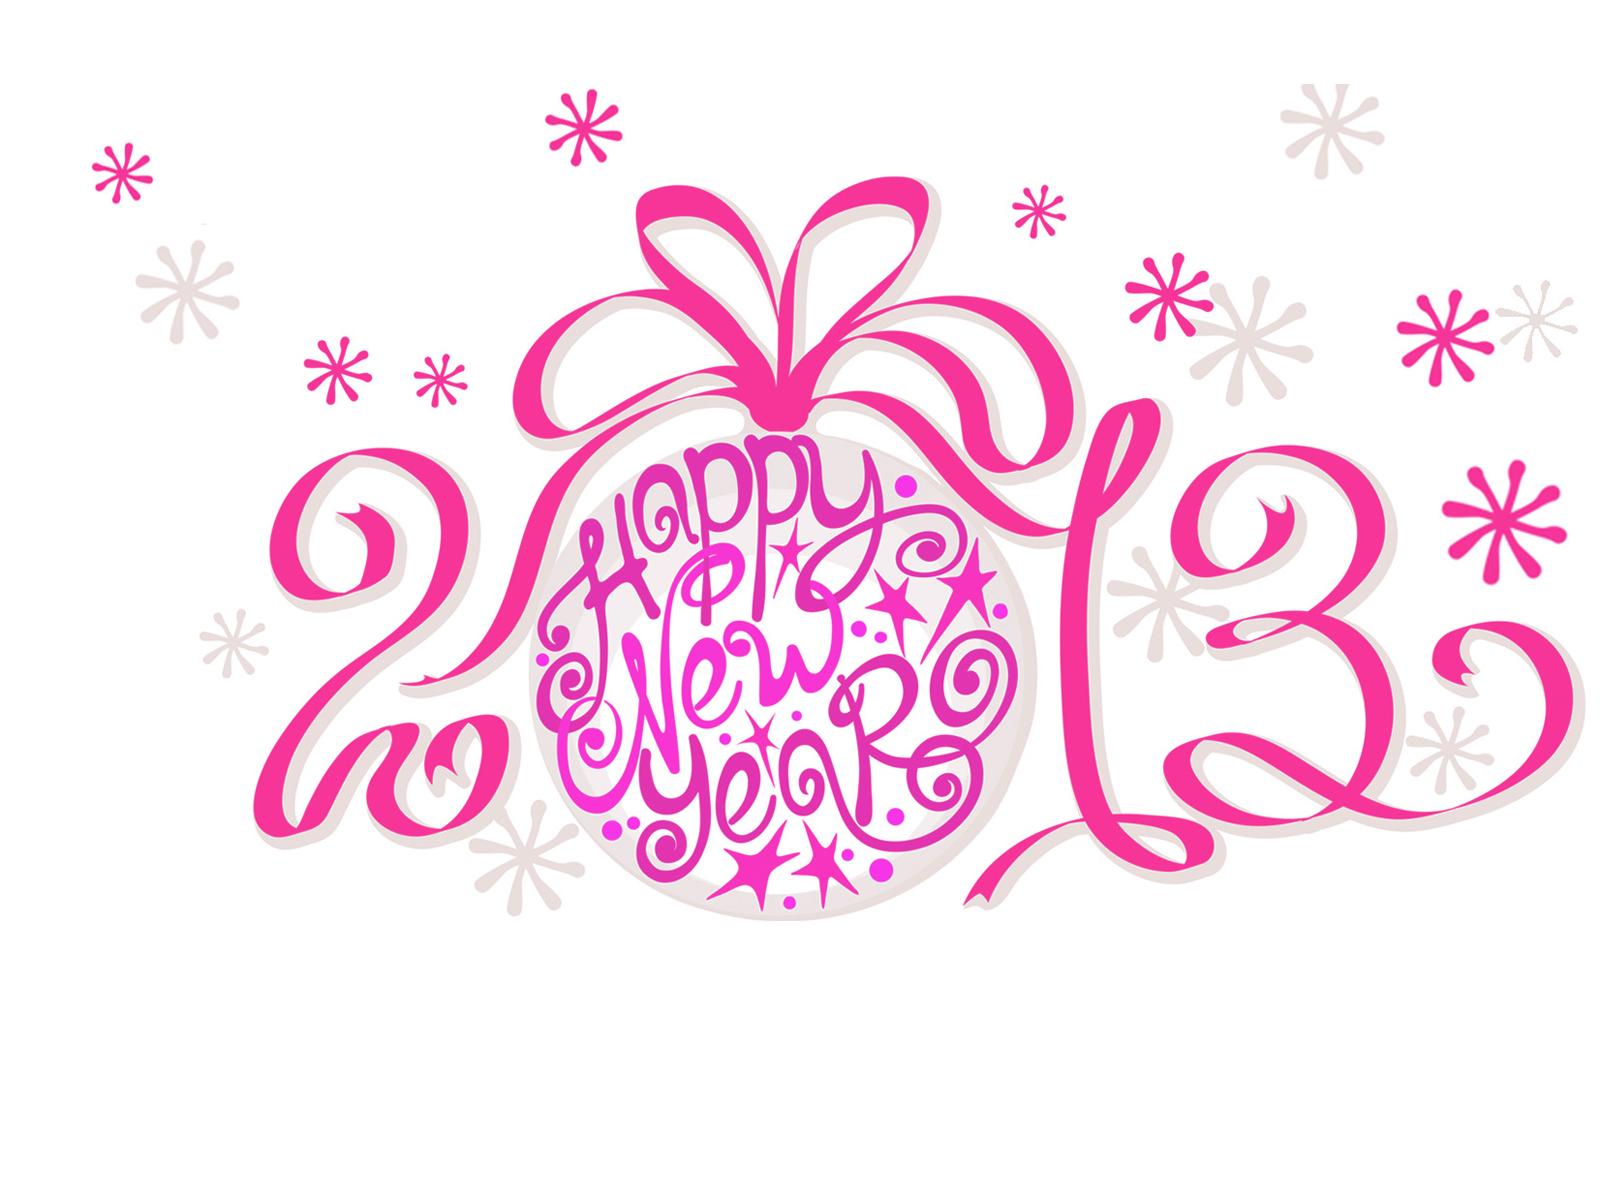 http://1.bp.blogspot.com/-SkiHxtWt318/UOKXiey-j0I/AAAAAAAAUPA/sCnumFhnll4/s1600/Happy-New-Year-2013-HD-Wallpaper-6.jpg